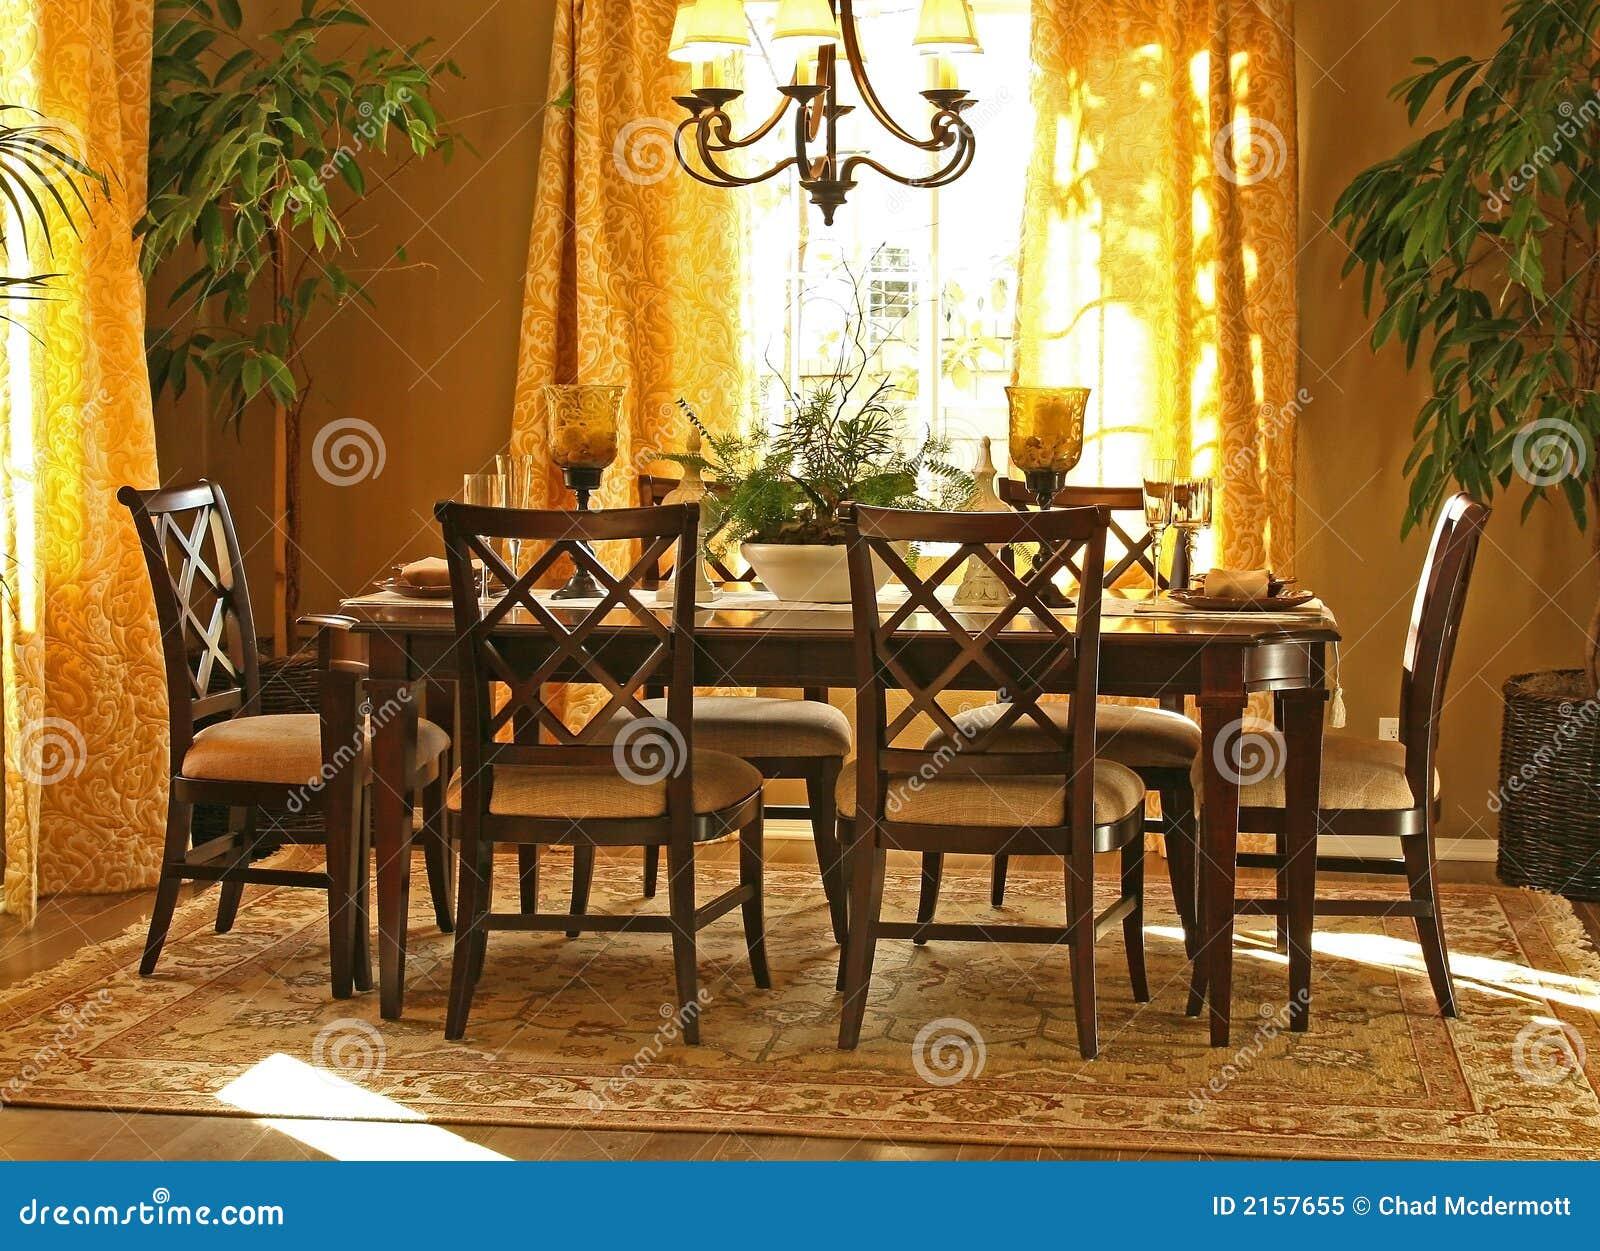 Model Home Interiors Royalty Free Stock Photo Image 2157655